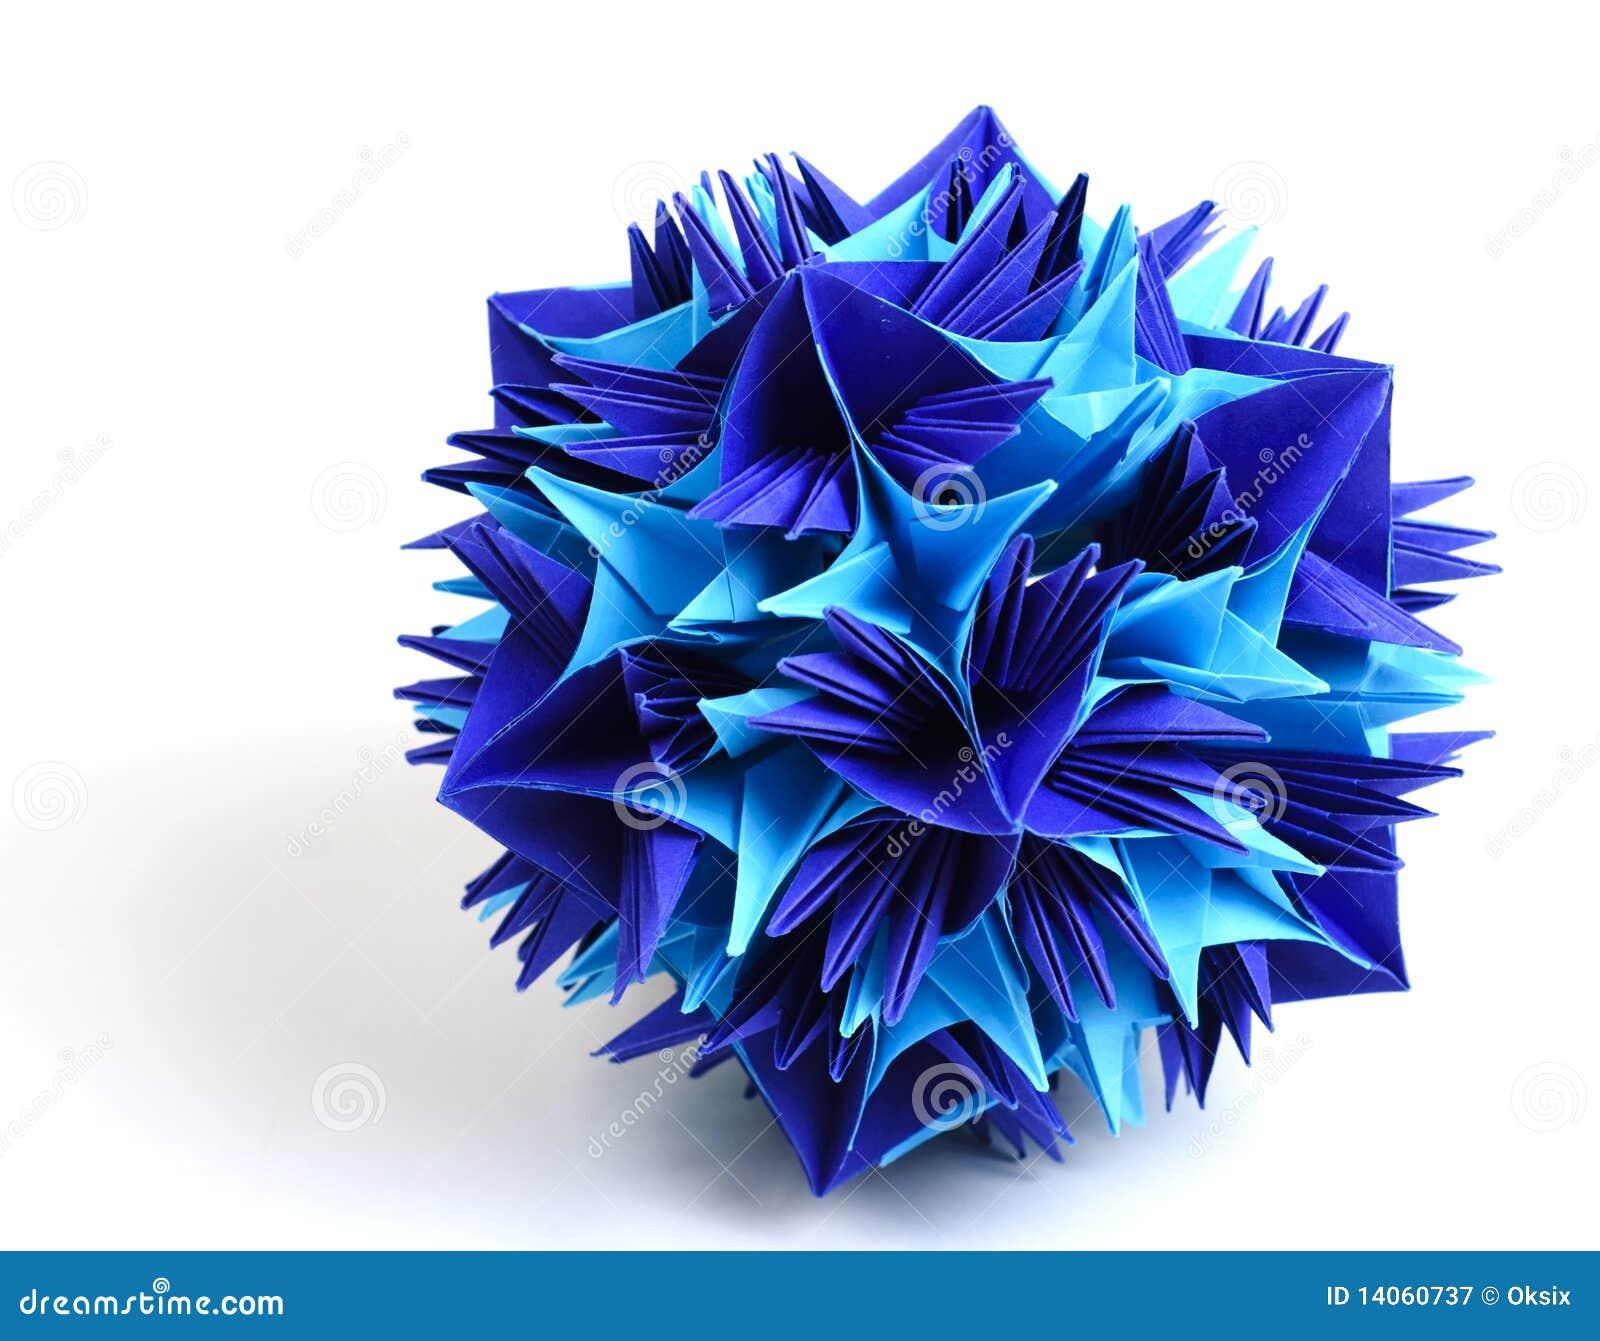 Colorfull origami unit snowflake isolated on white background.